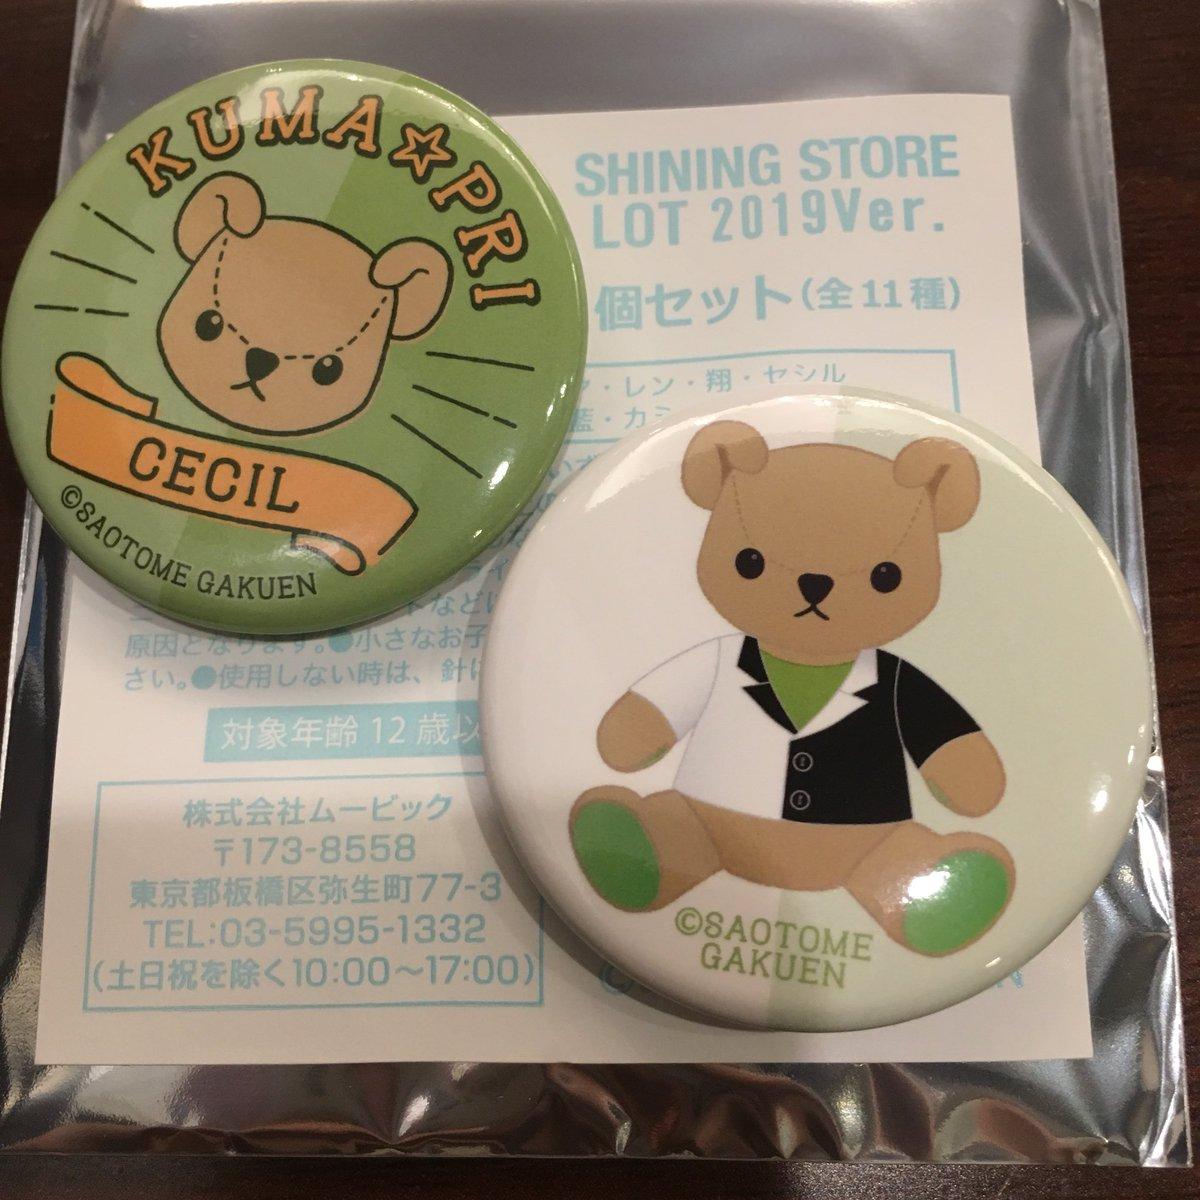 RT @kr618_ky729: 【譲渡】うたプリ シャニスト くまプリくじ LOT D賞...